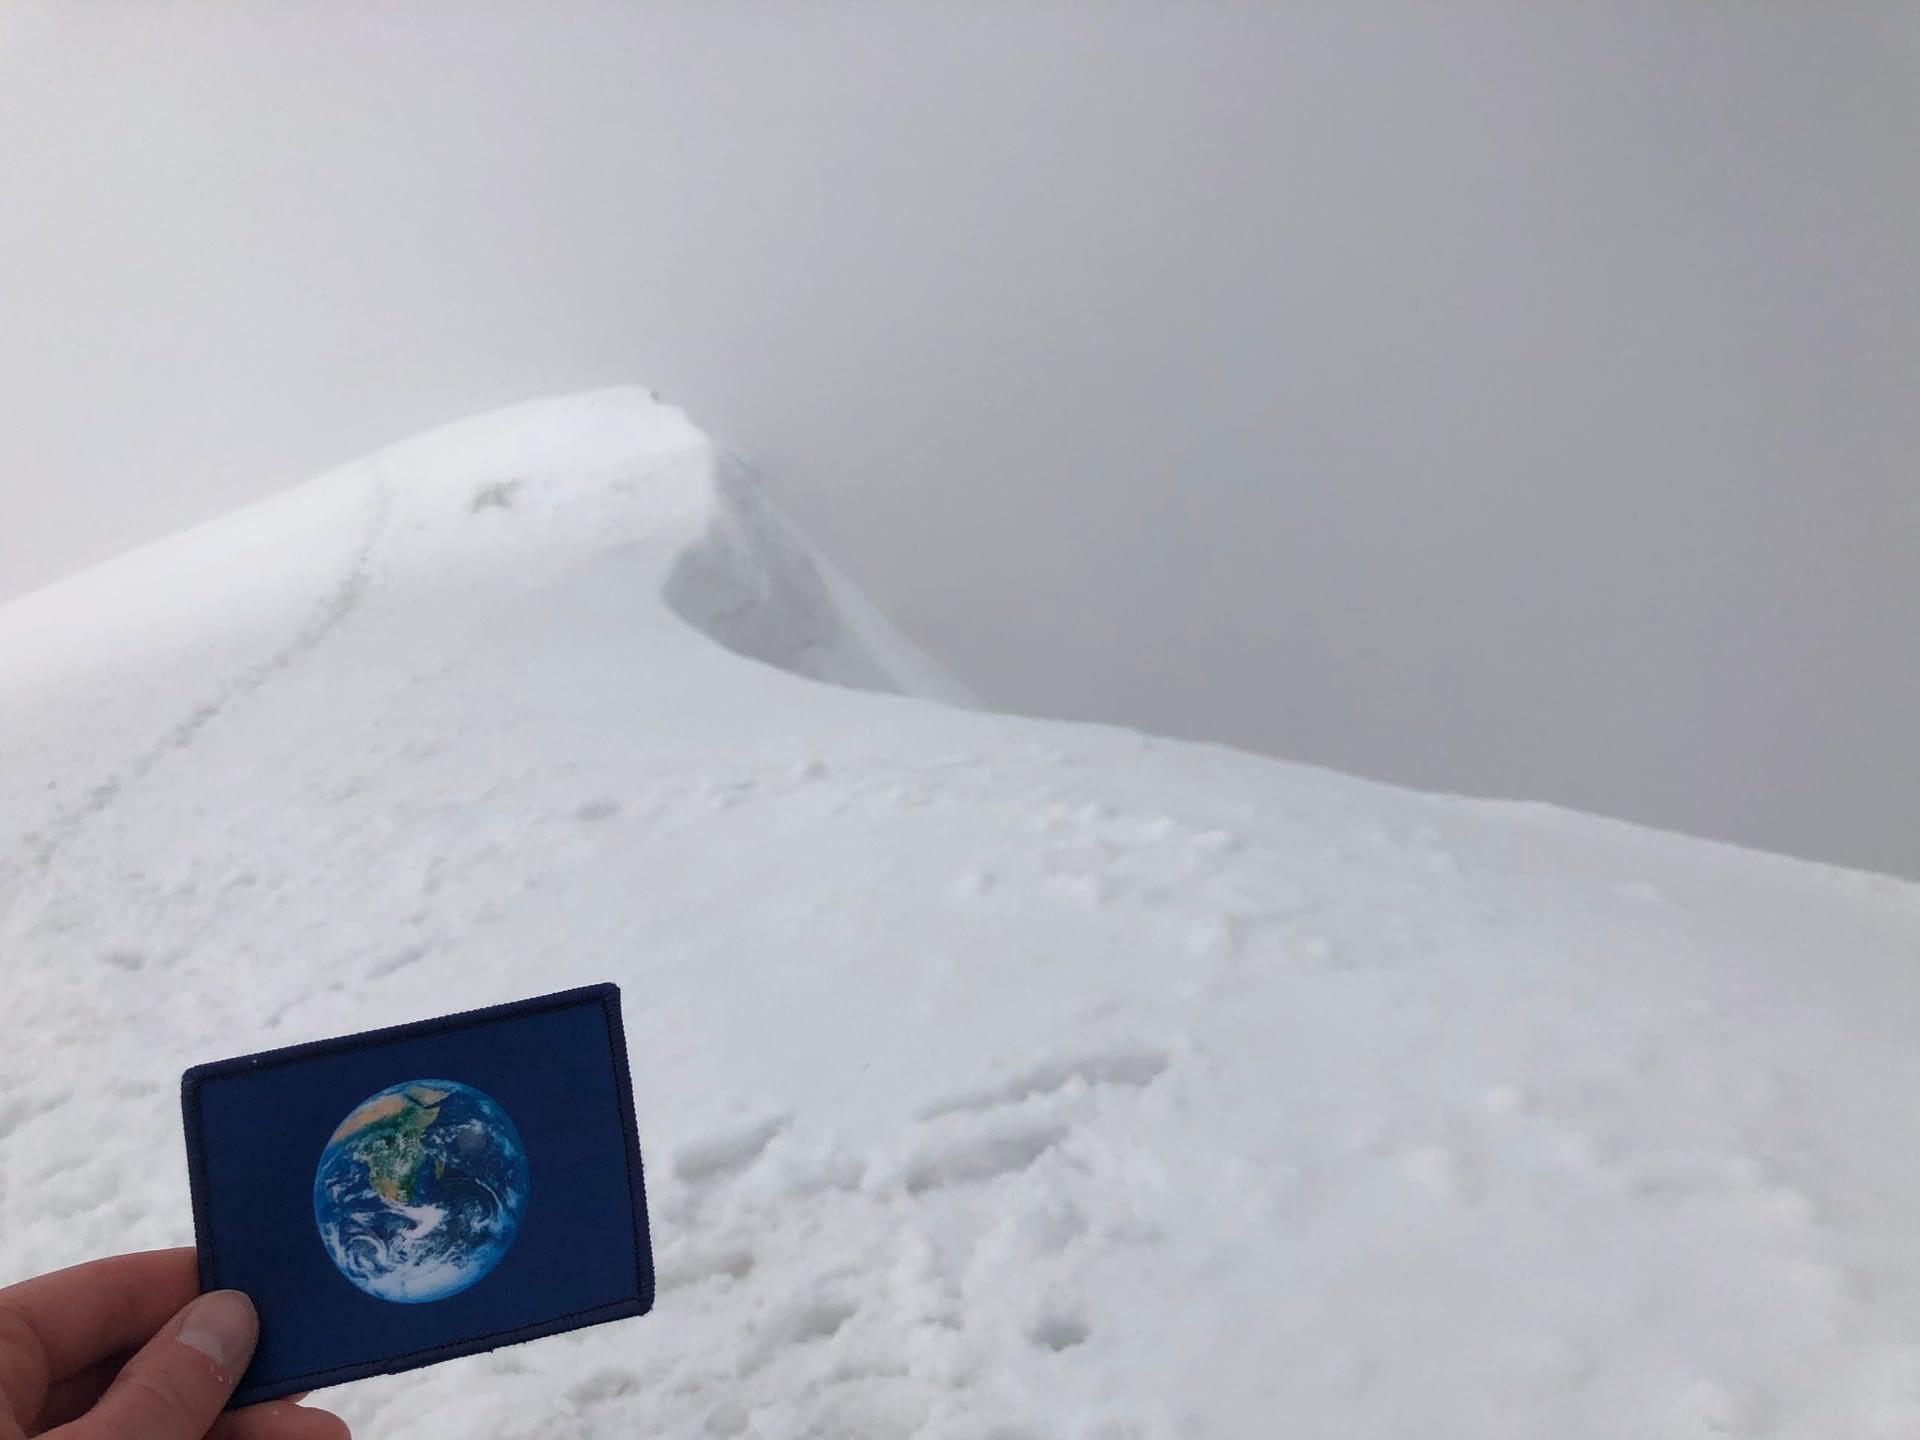 The caldera rim of Mount Saint Helens was #EarthFlagged !